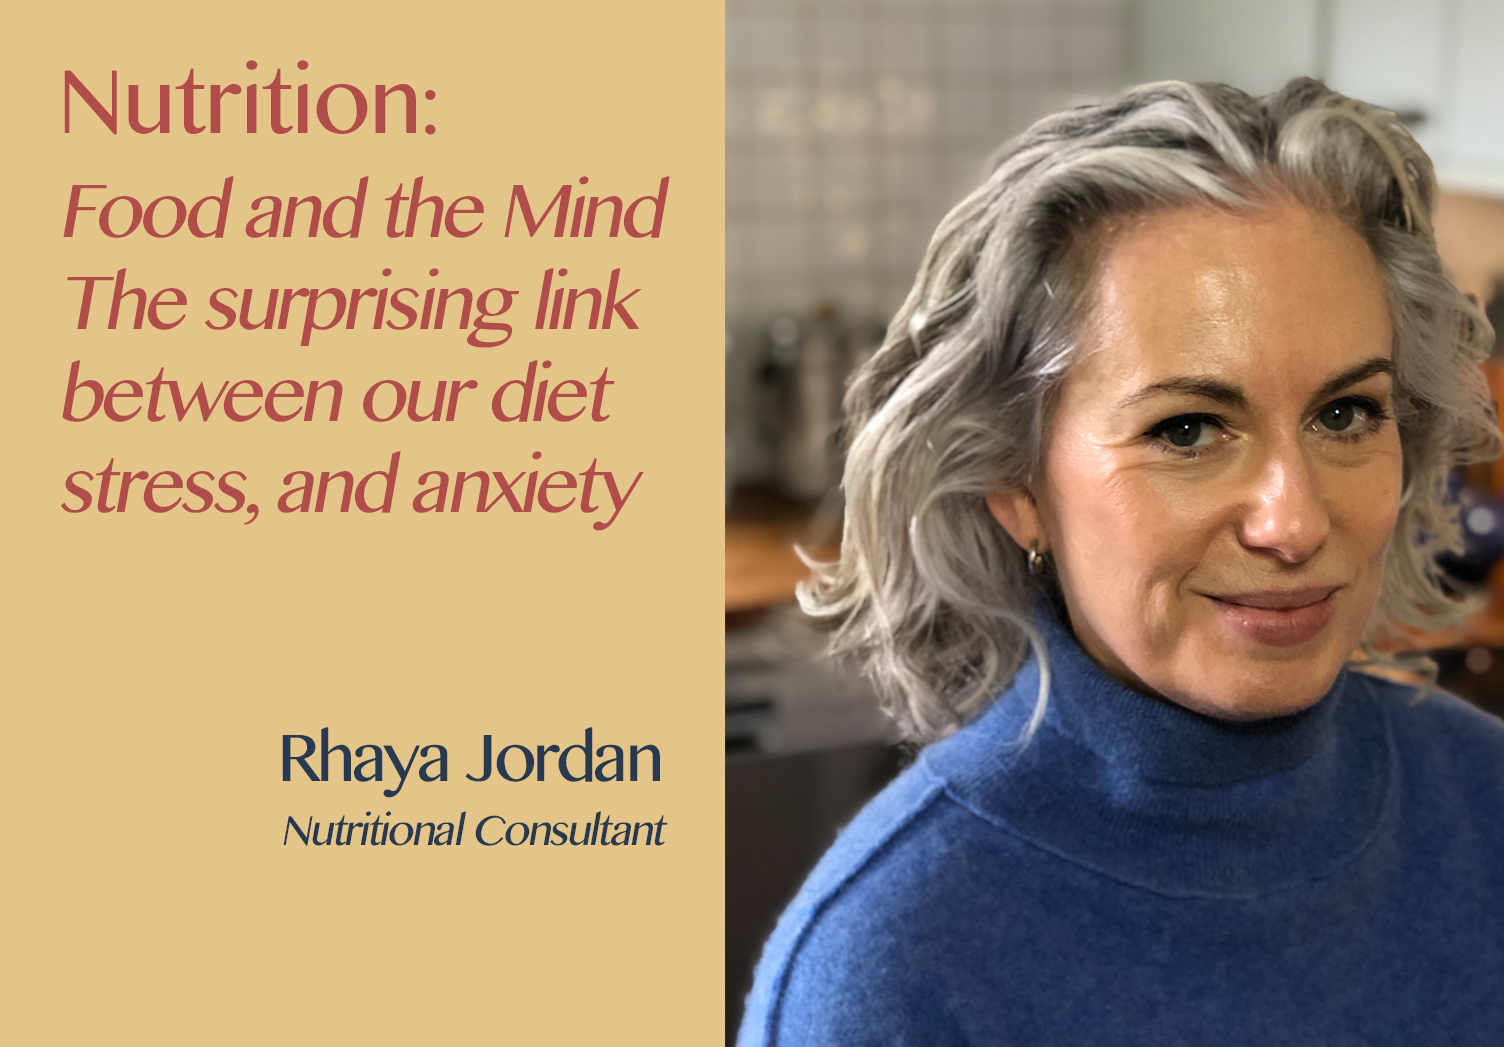 The Hospitality Resilience Series on Nutrition with Rhaya Jordan